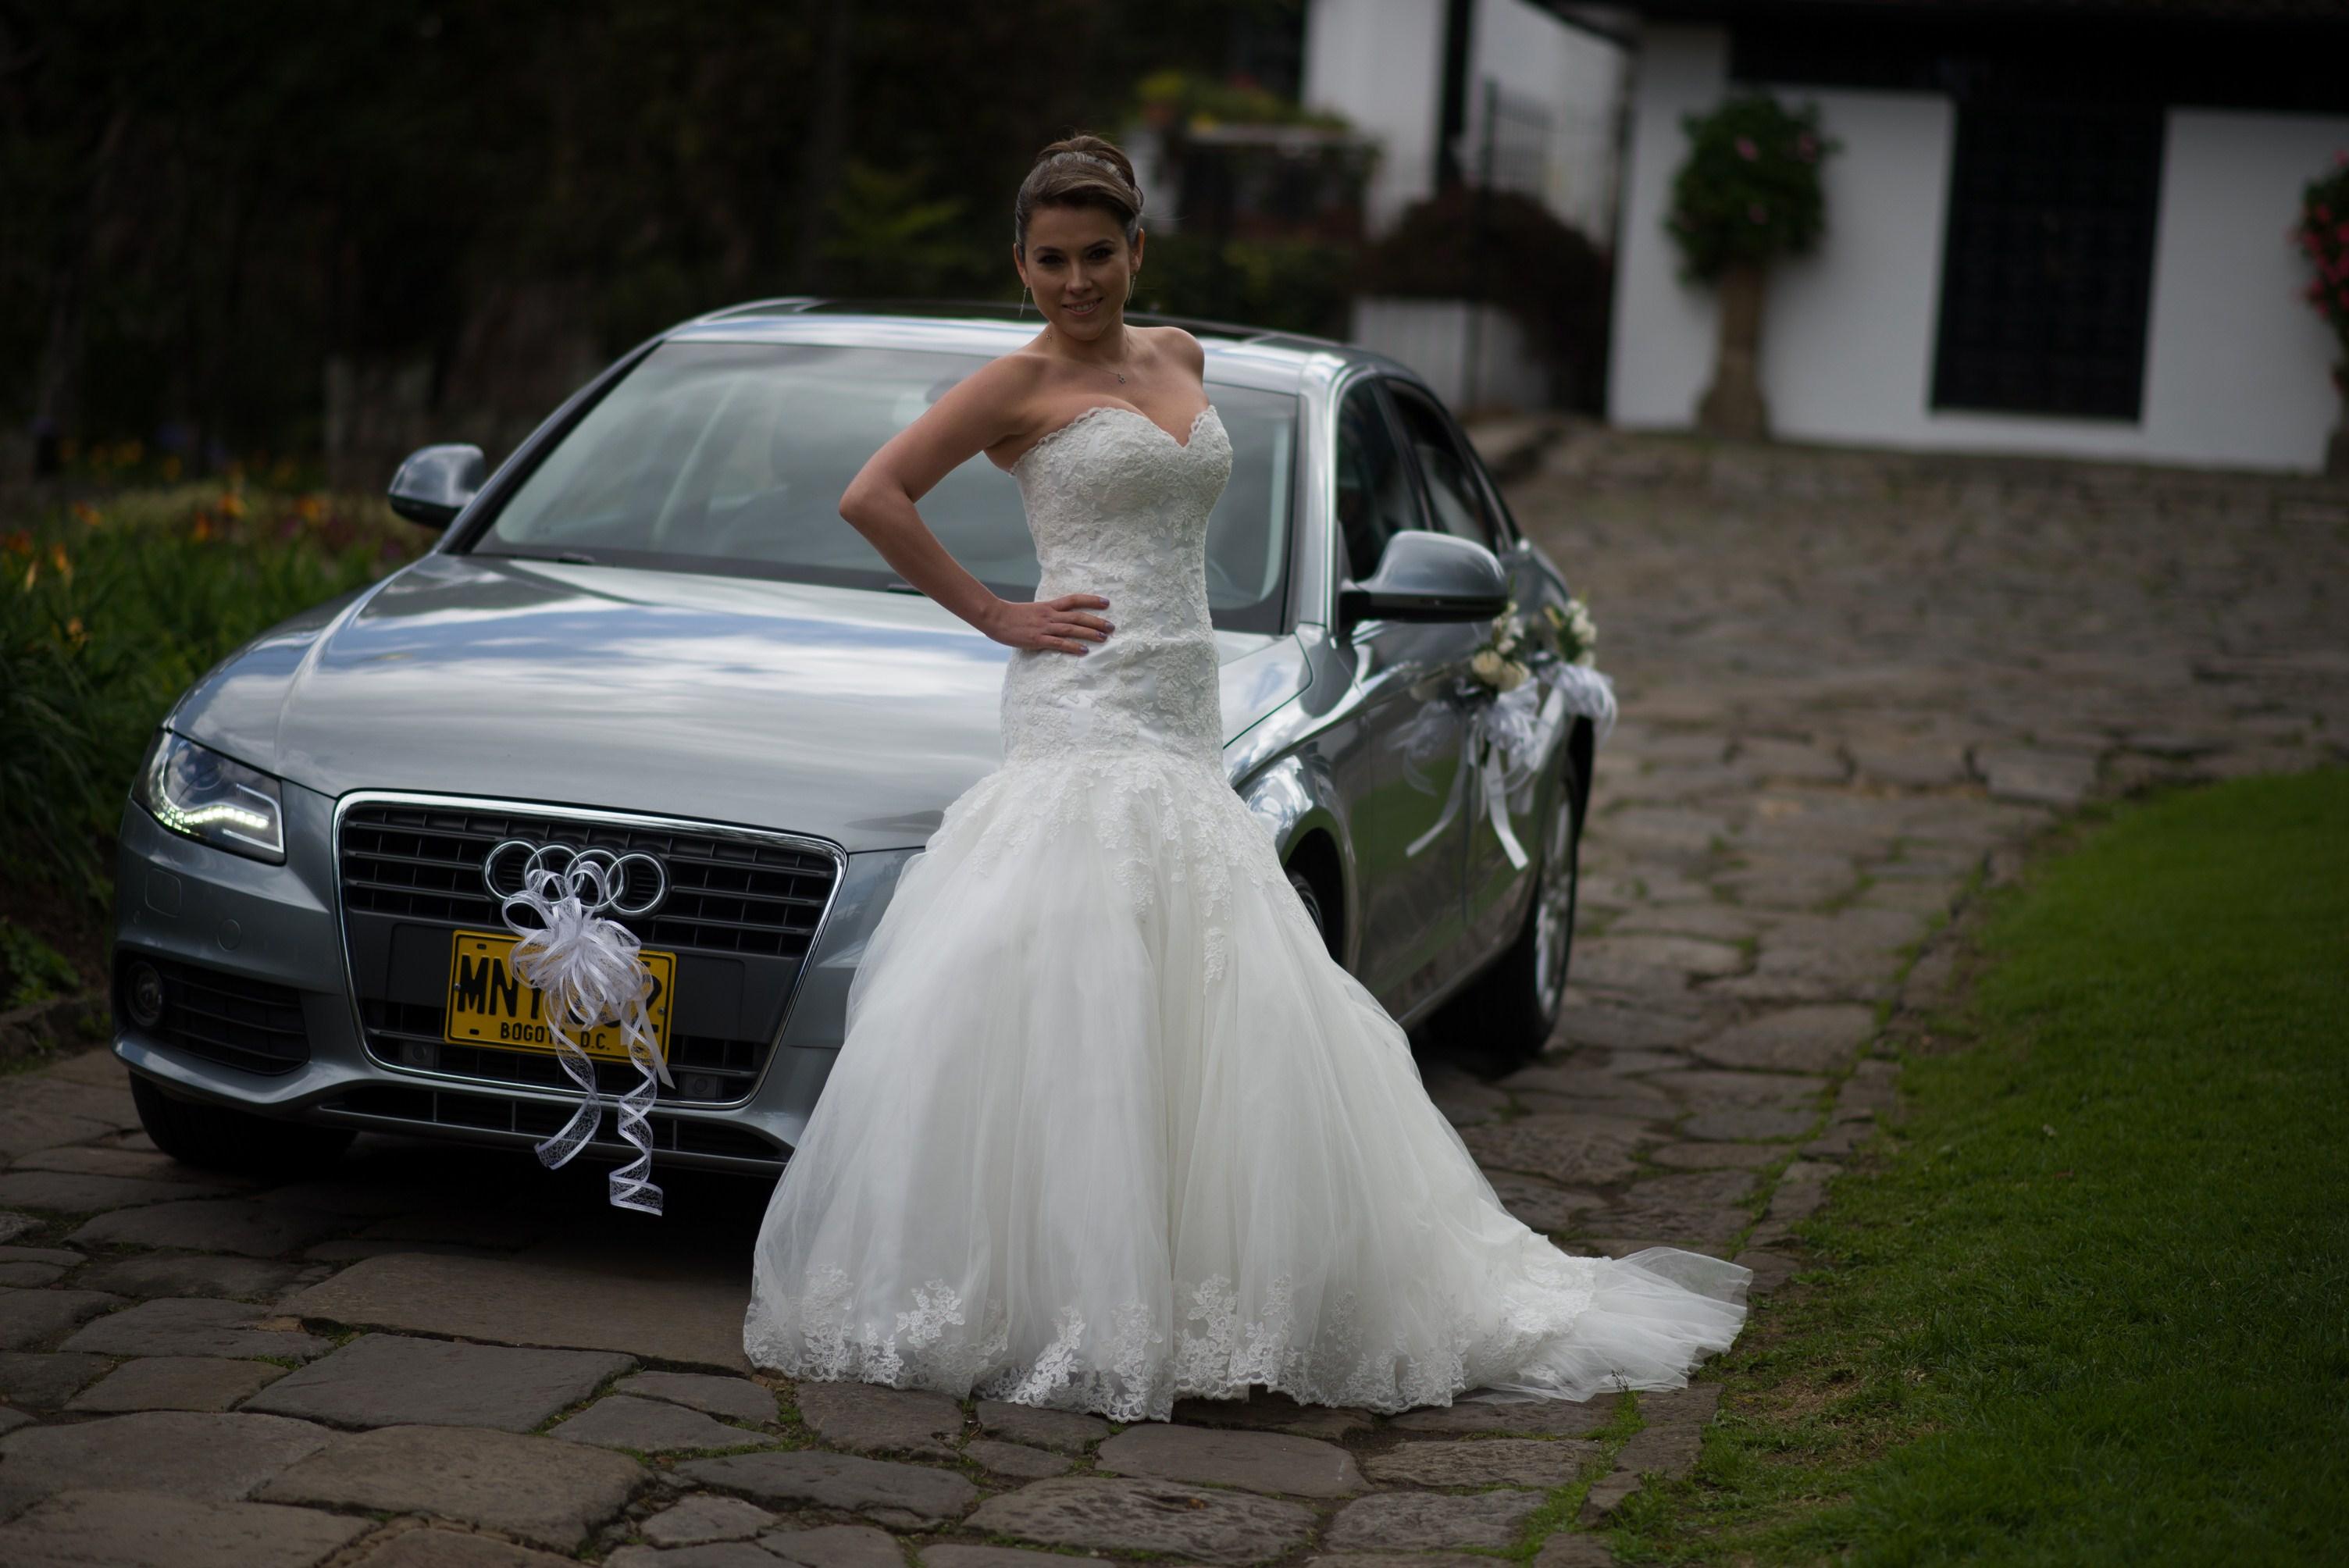 Audi Luxury A4